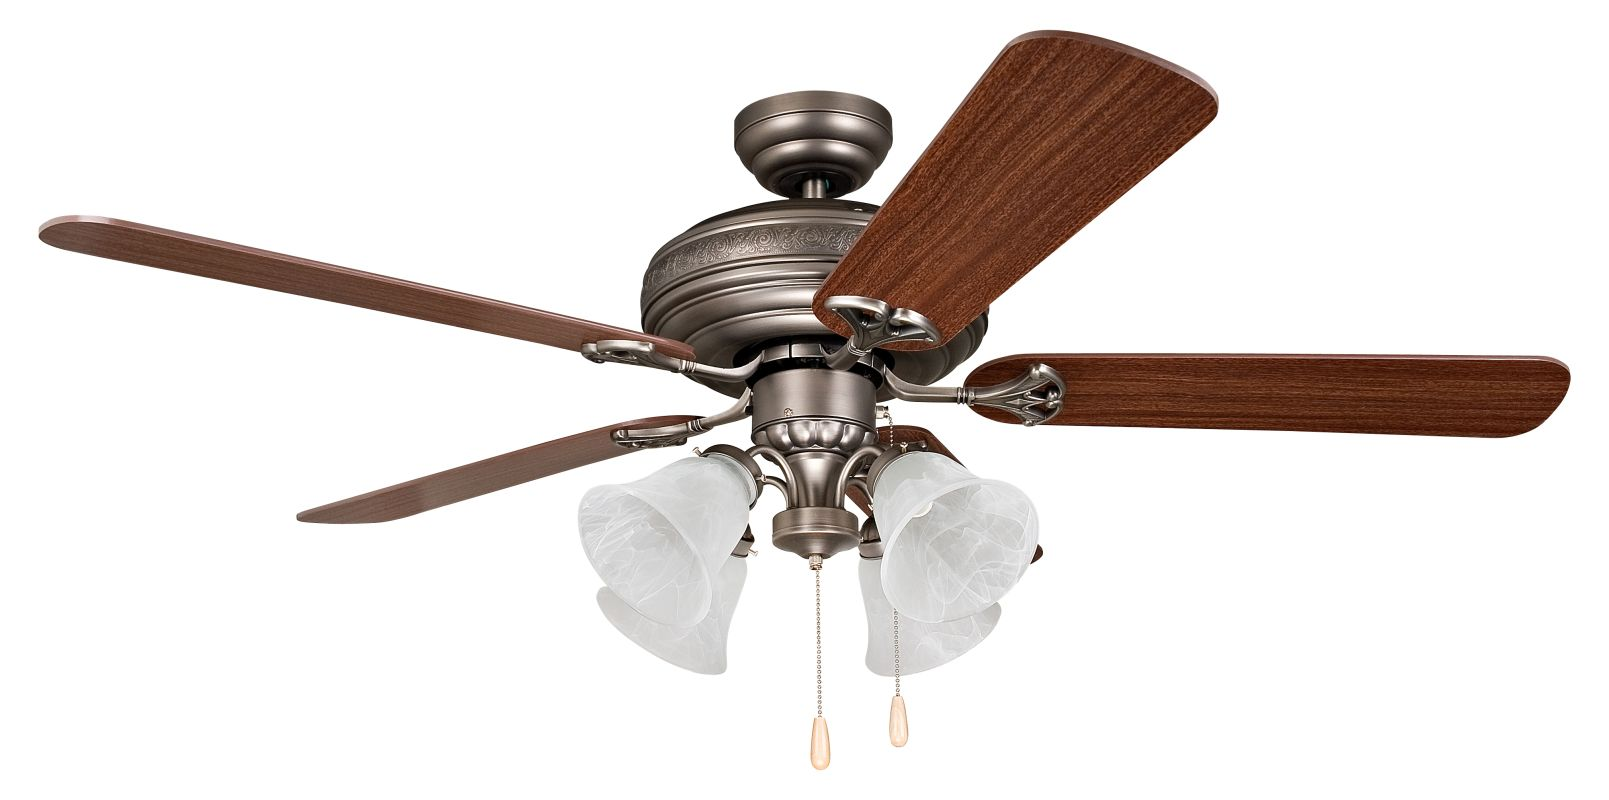 "Ellington Fans Beaufort-L Classic 52"" 5 Blade Indoor Ceiling Fan -"